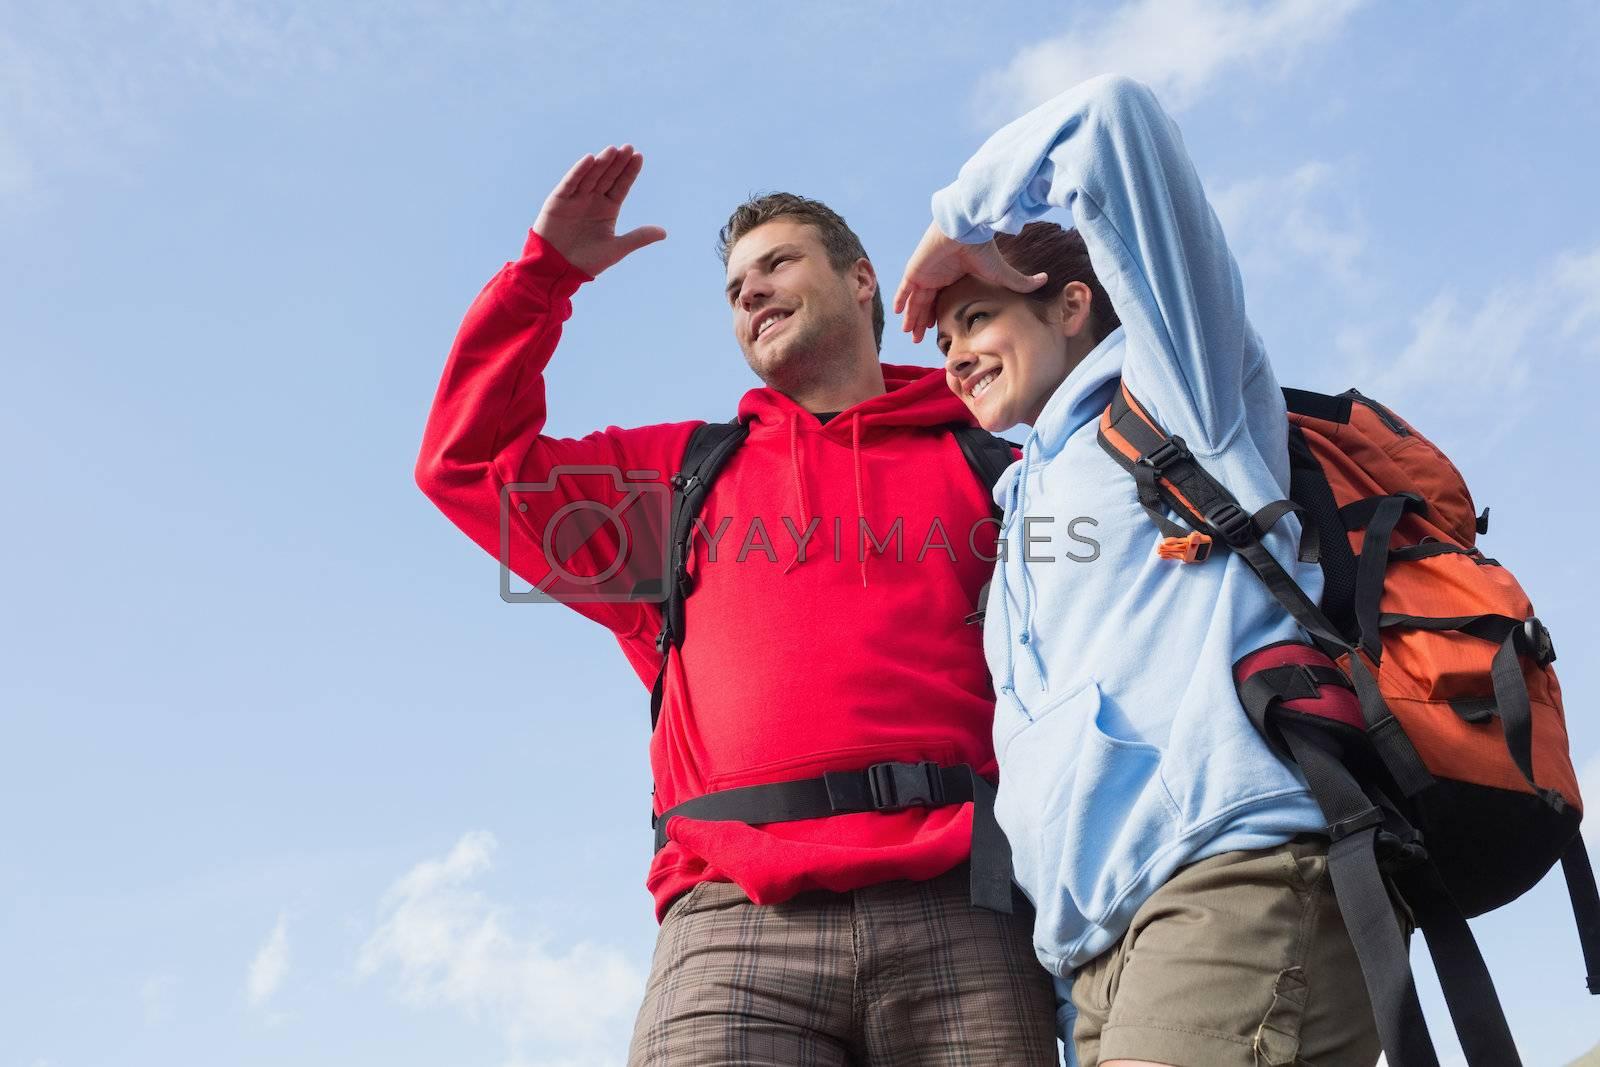 Couple on a hike looking ahead by Wavebreakmedia